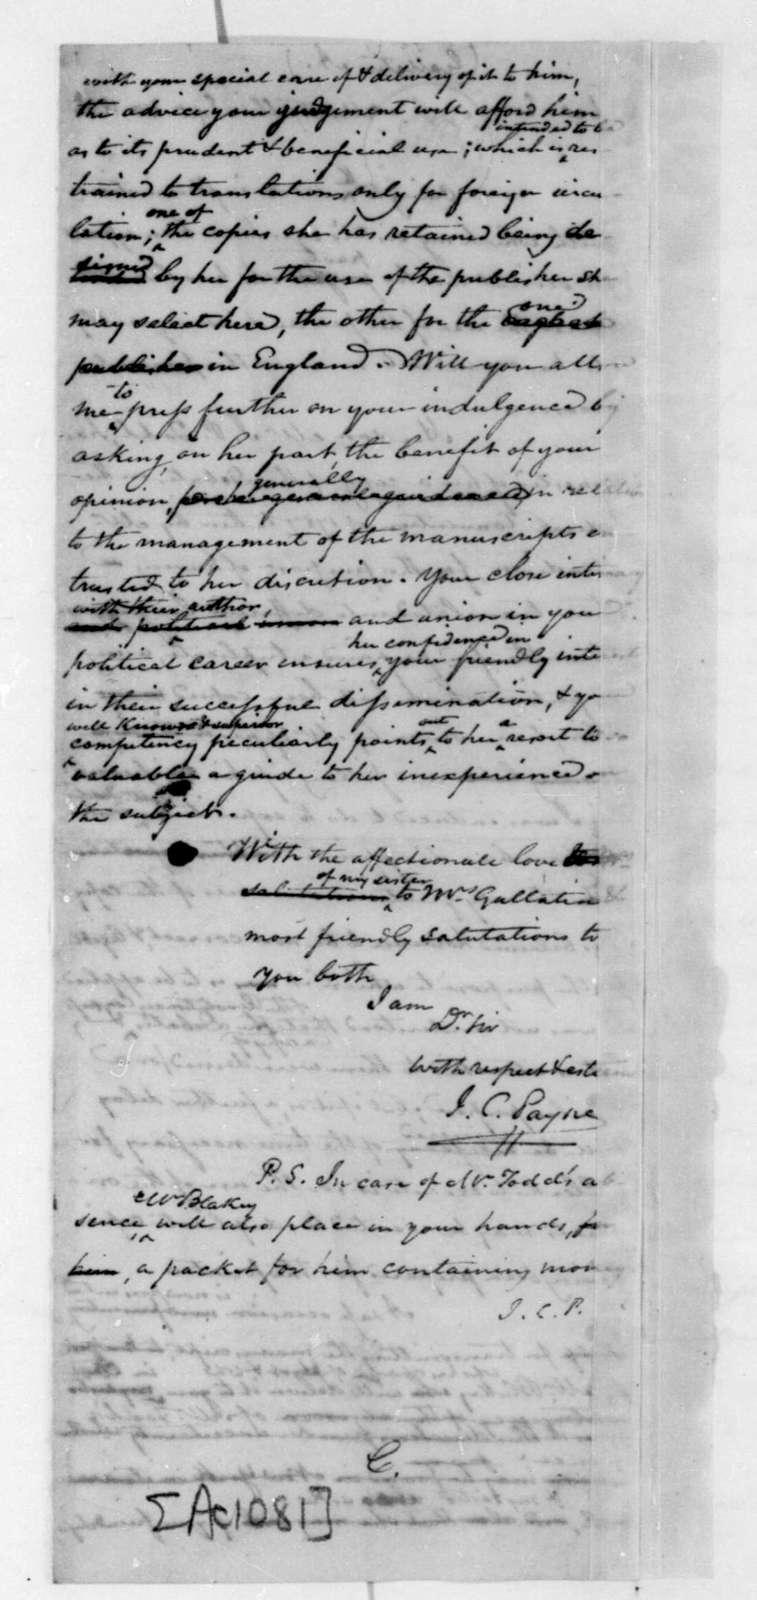 John C. Payne to Albert Gallatin, September 30, 1836.